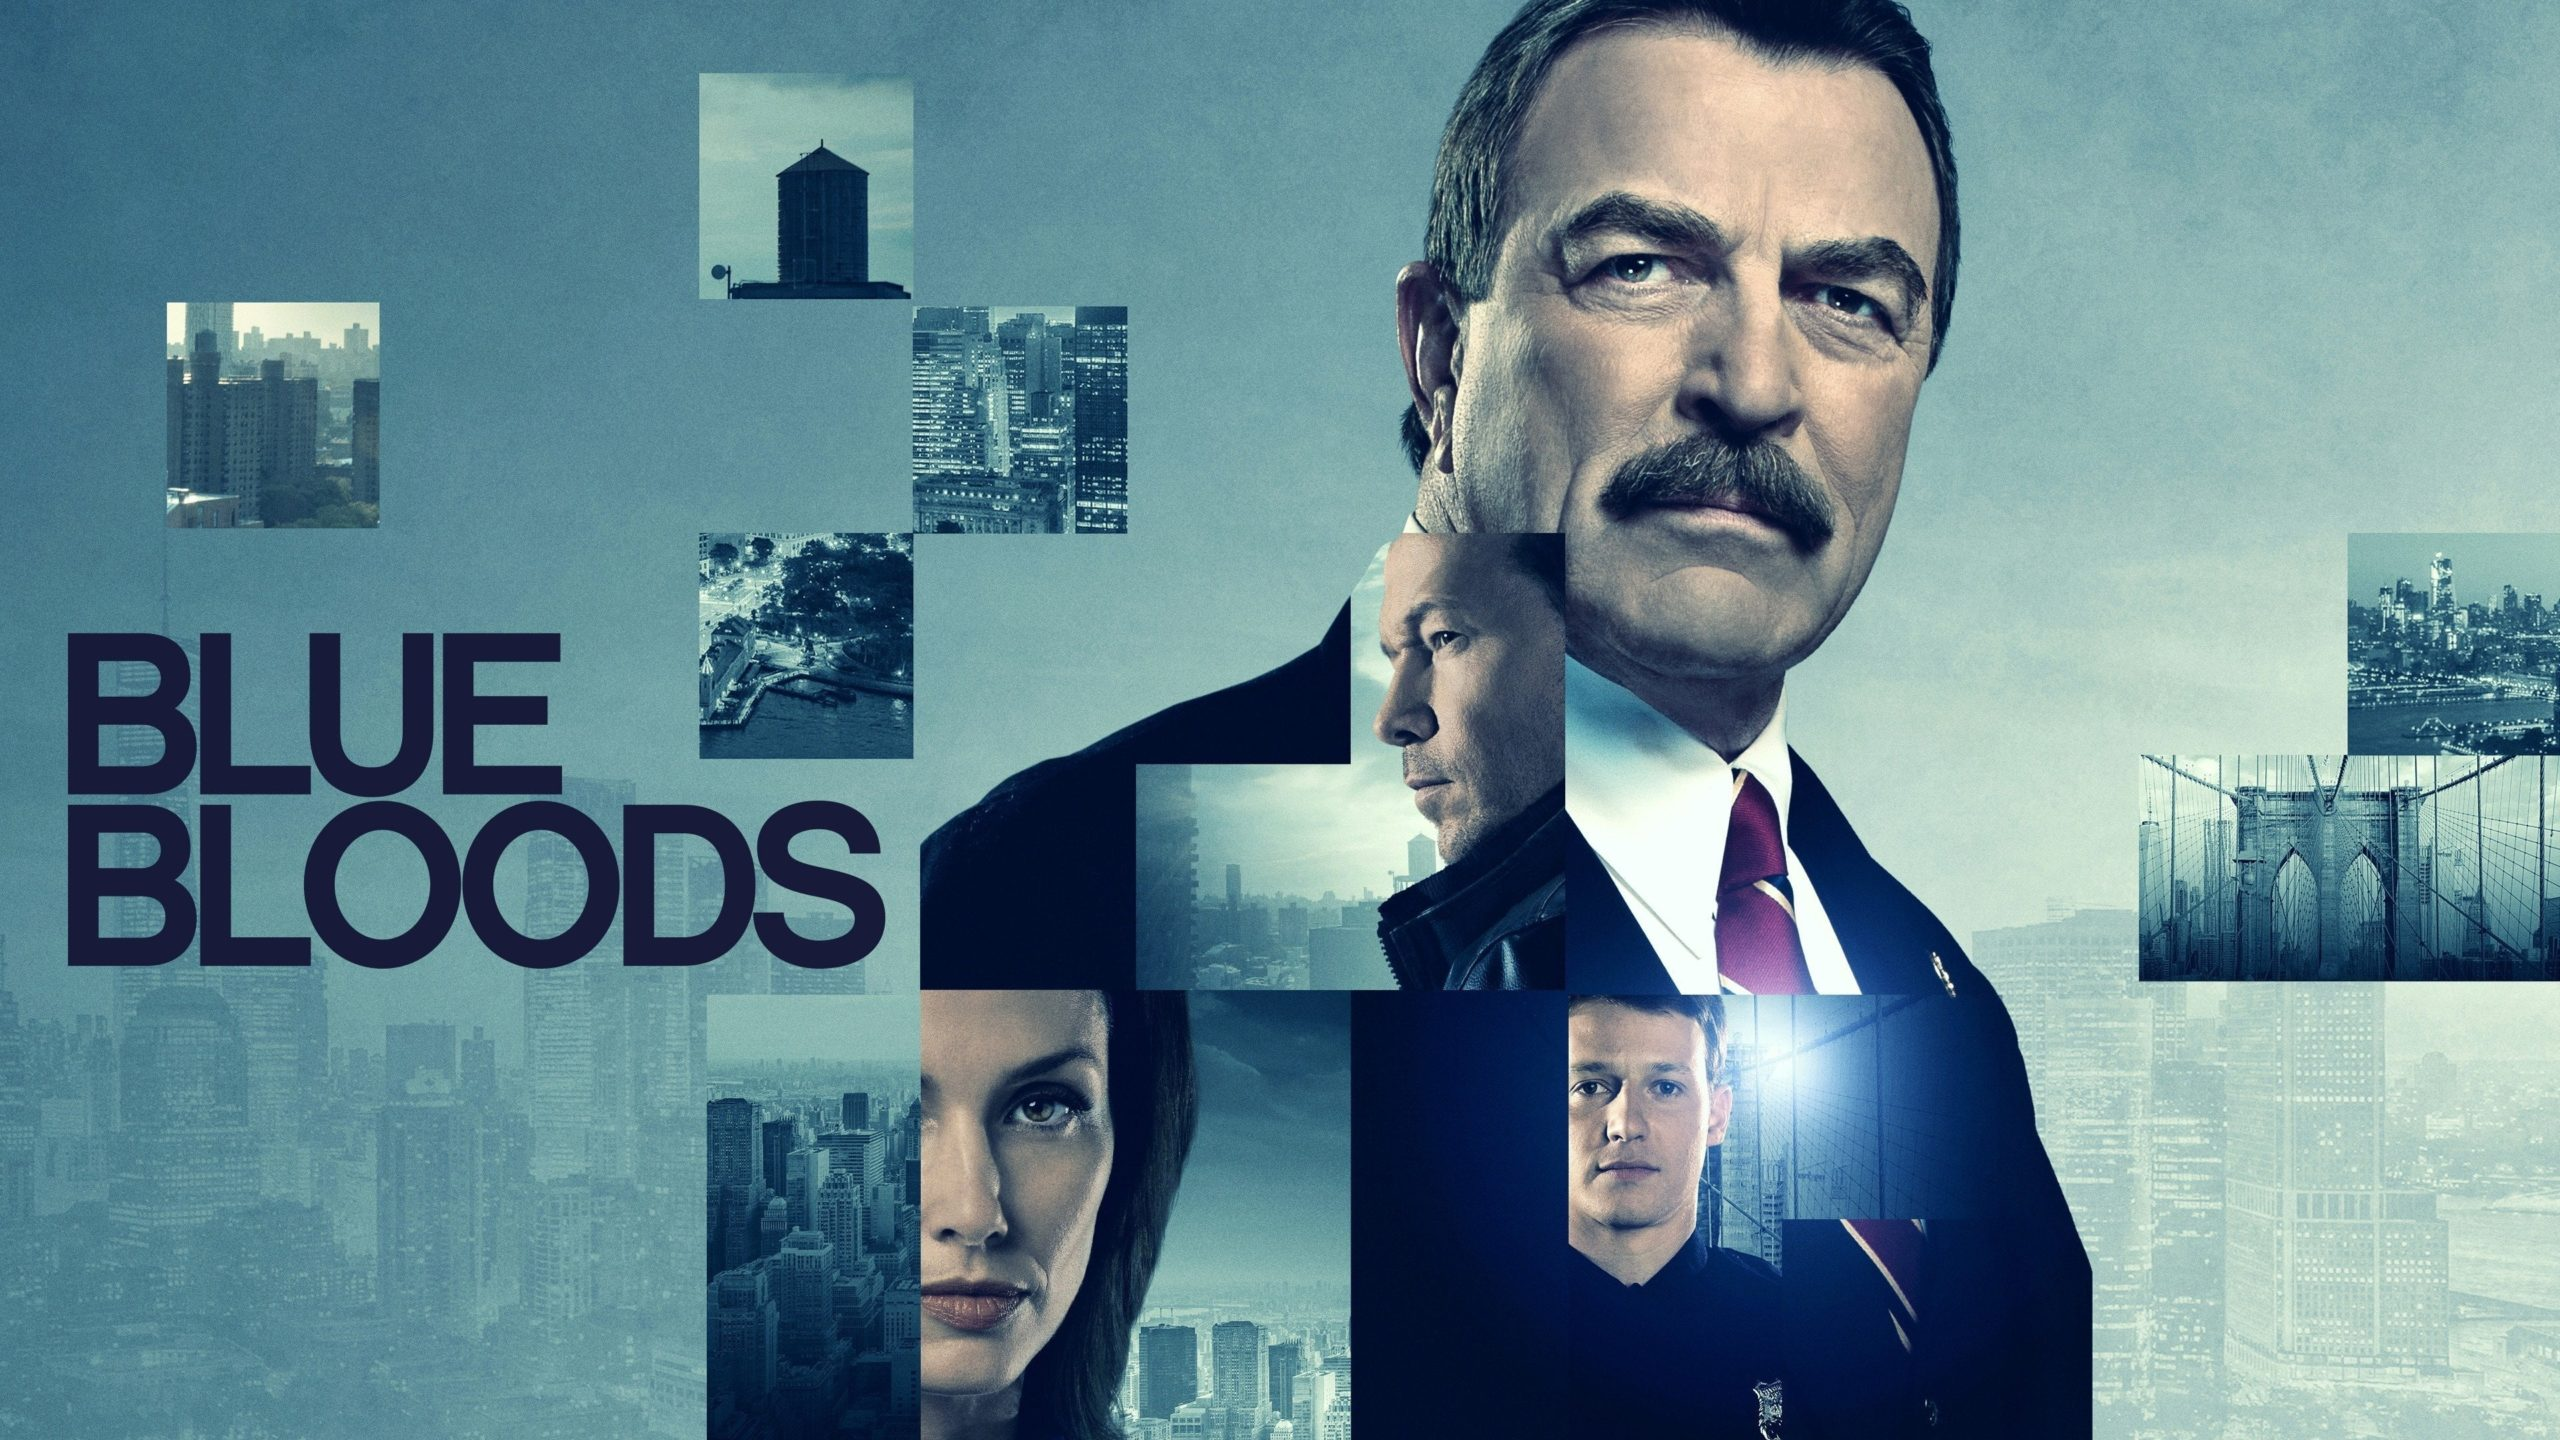 Blue Bloods Season 11 Episode 1